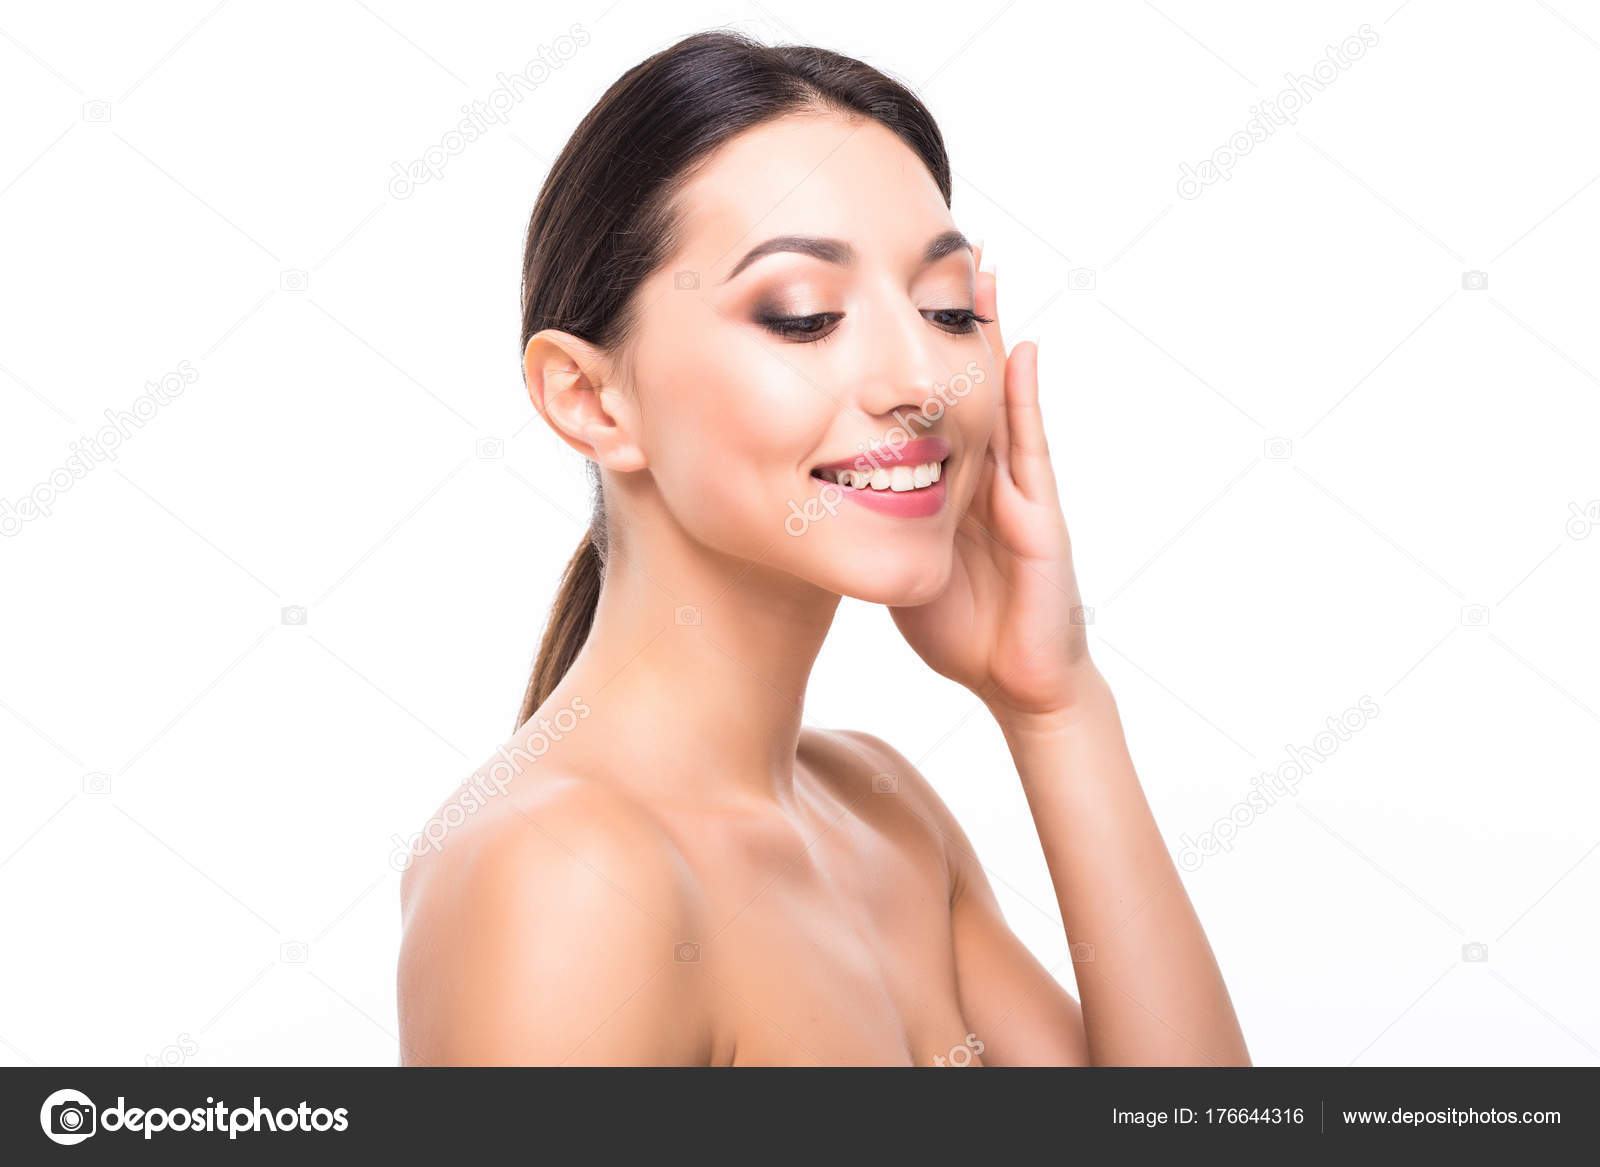 Spa Girl Beautiful Model Woman With Healthy Skin Cute Face Spa Beauty Facial Treatment And Cosmetology Concept Stock Photo C Dan Grytsku Gmail Com 176644316